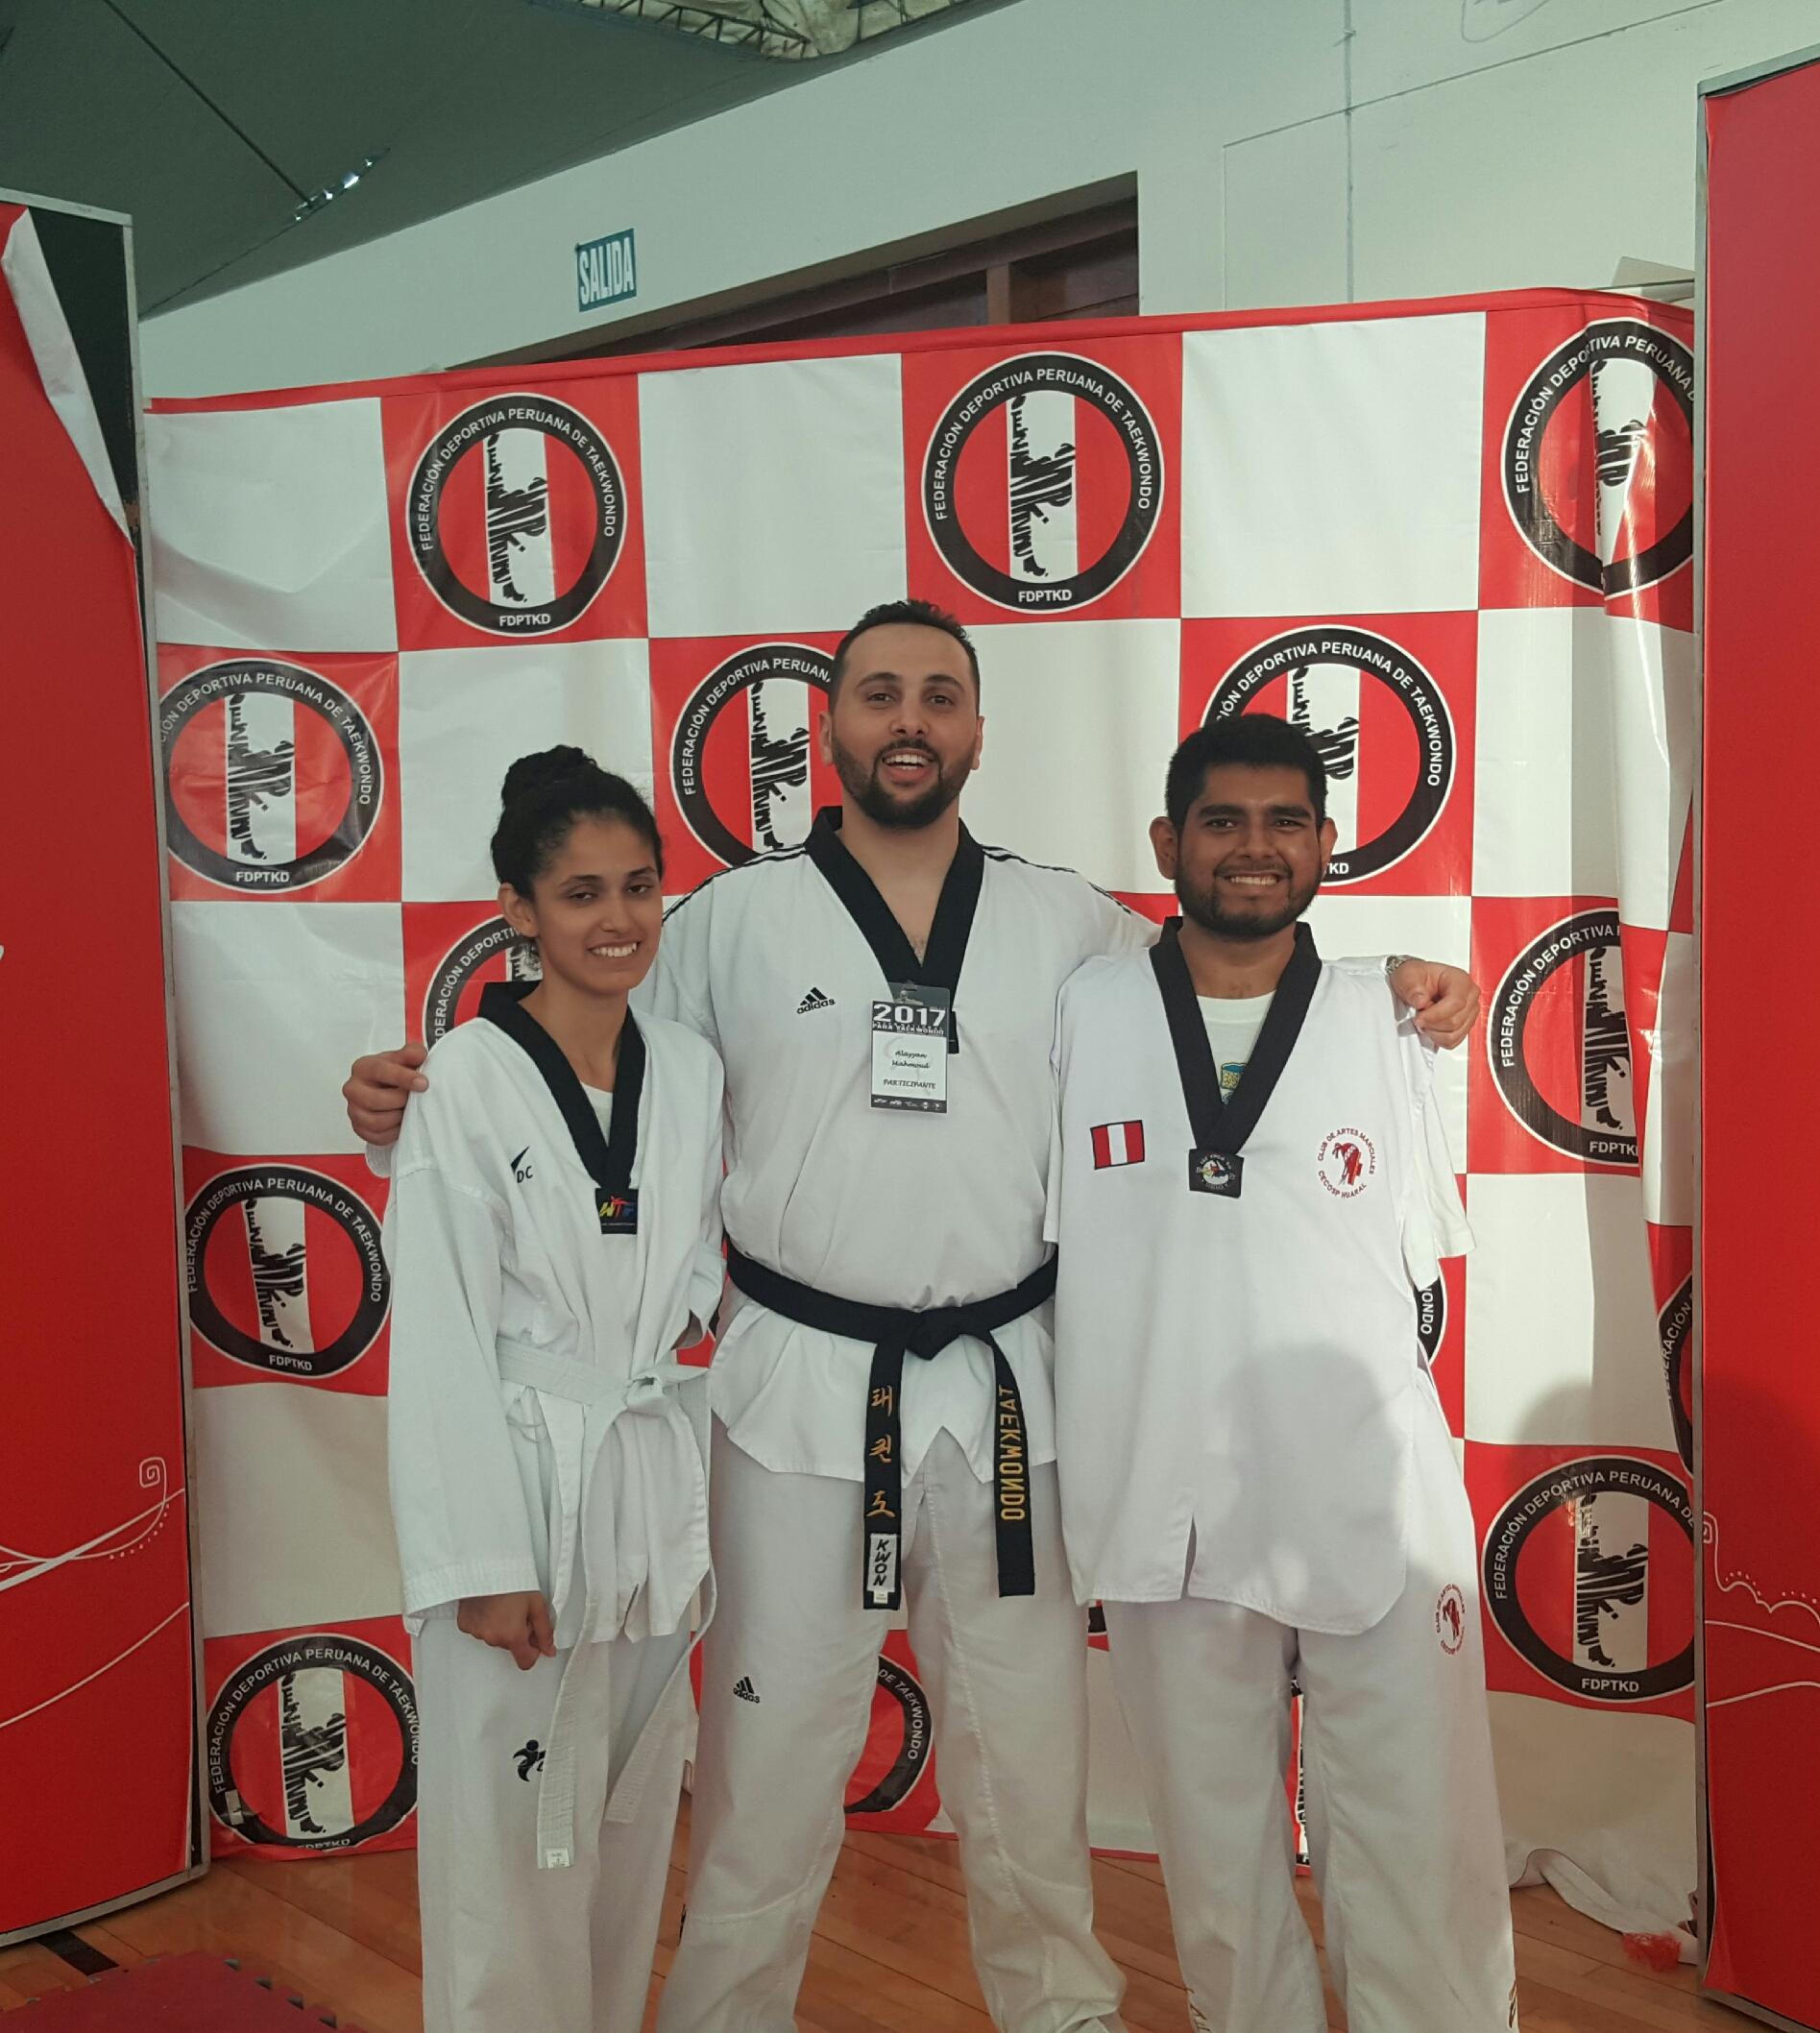 club taekwondo molenbeek